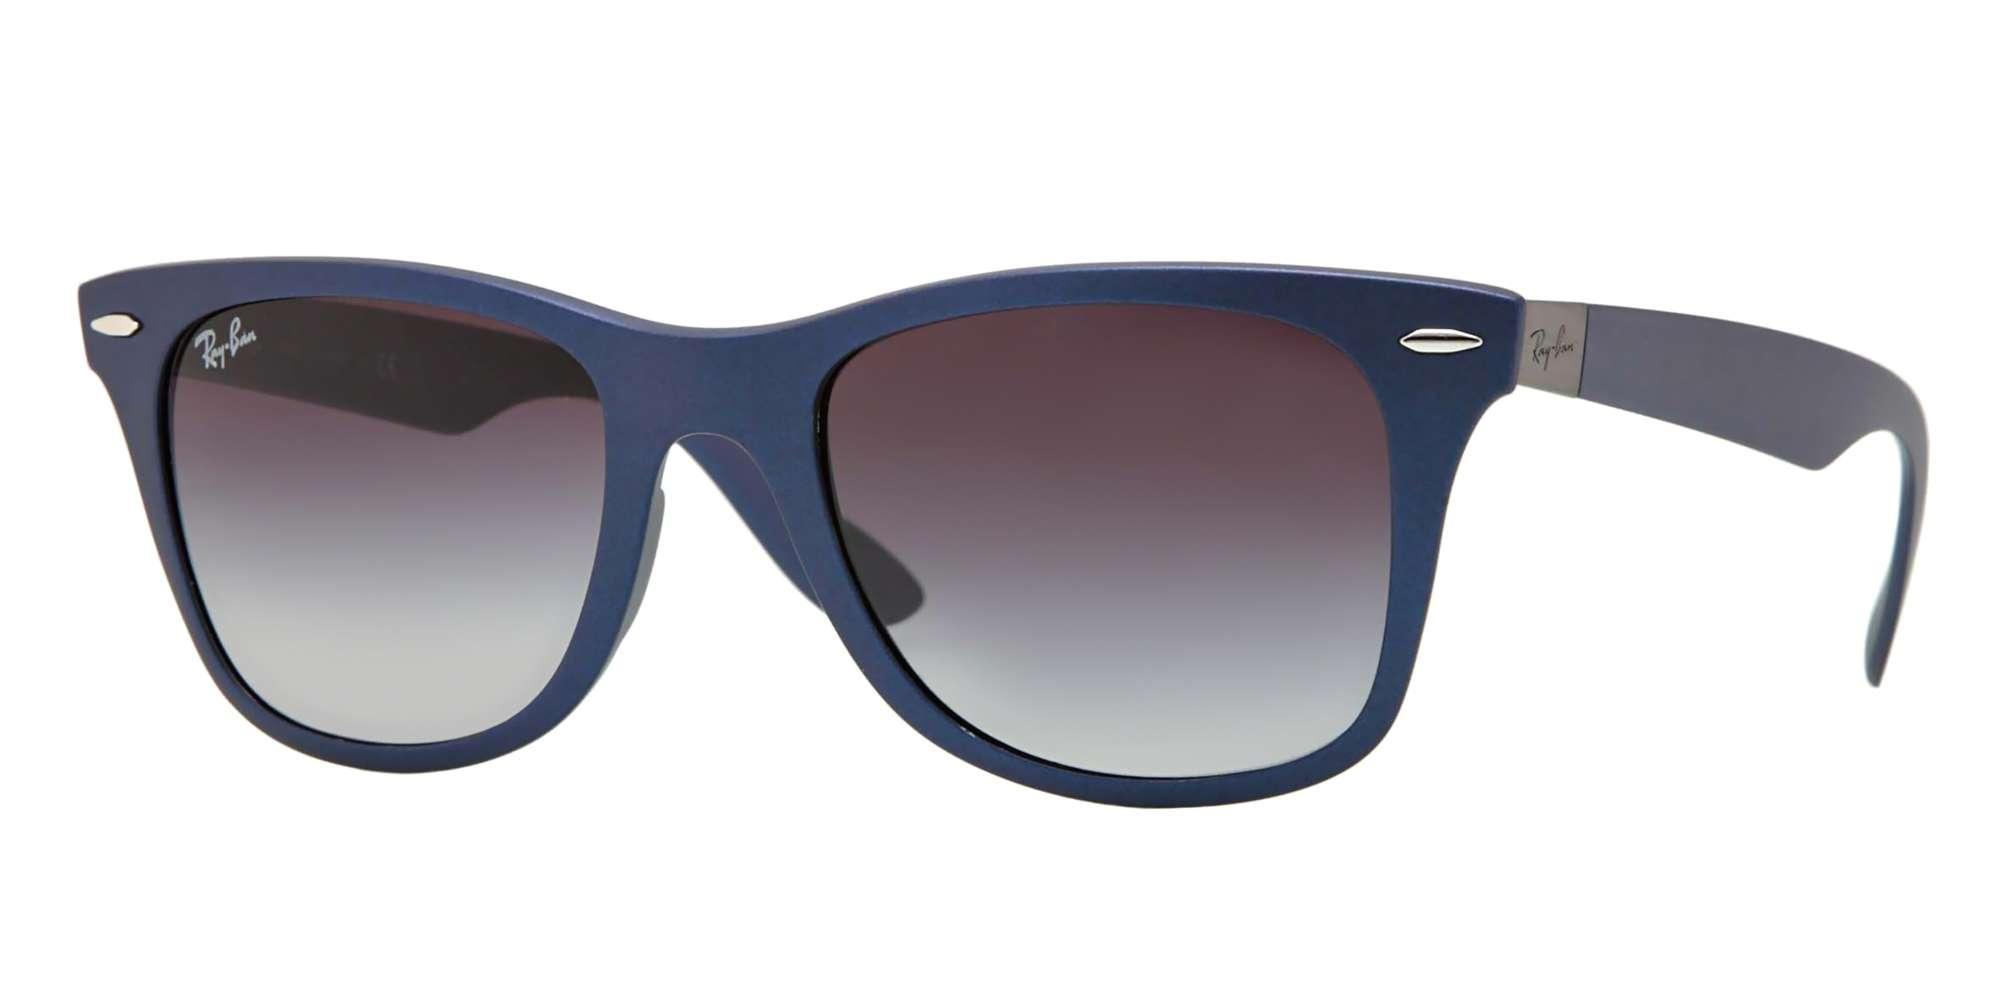 BLUE / GREY GRADIENT lenses